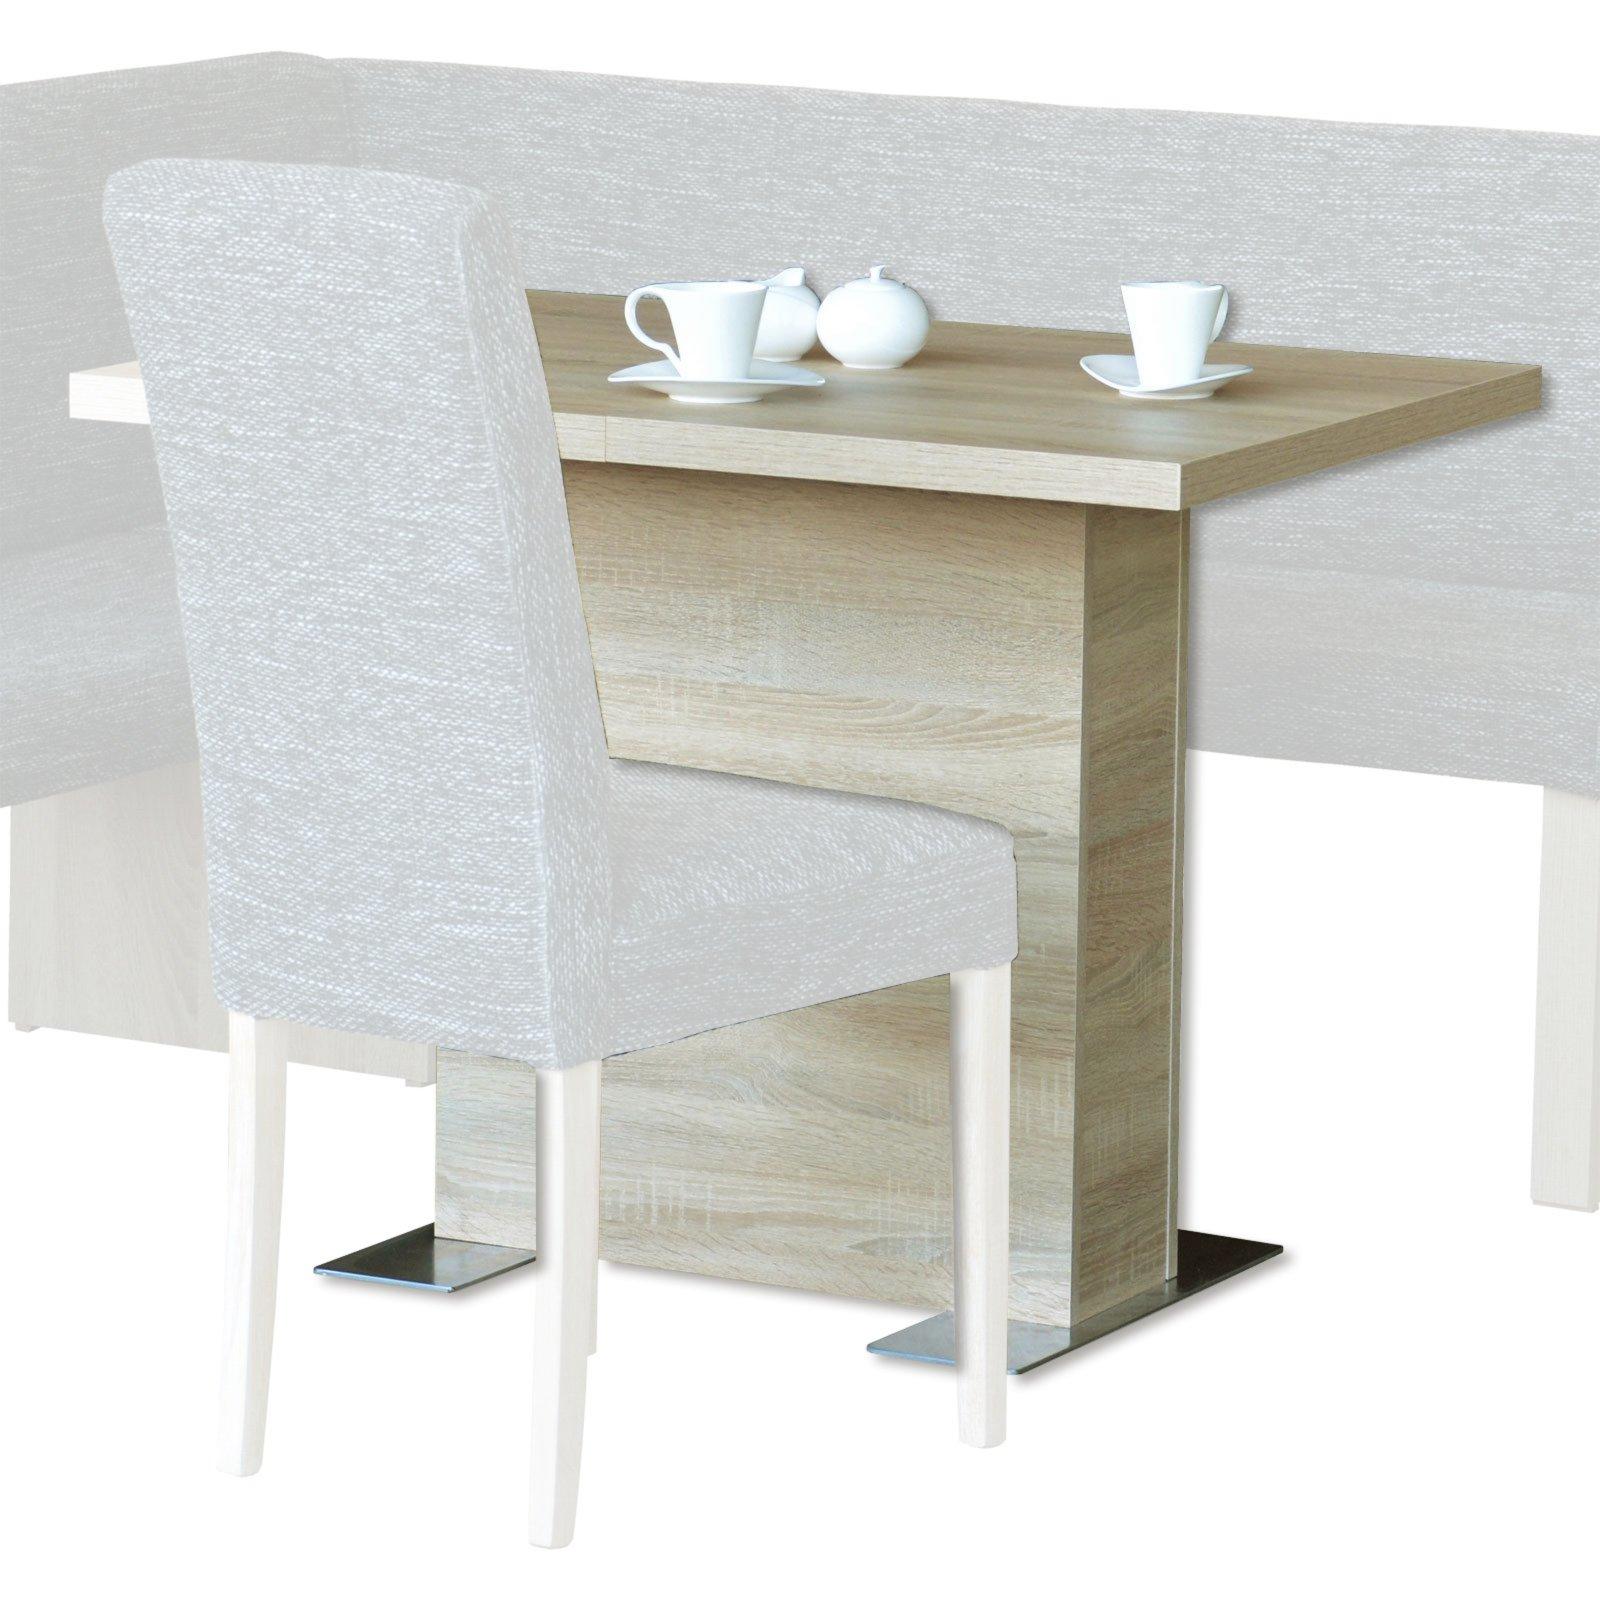 Tisch CAPRICE 6